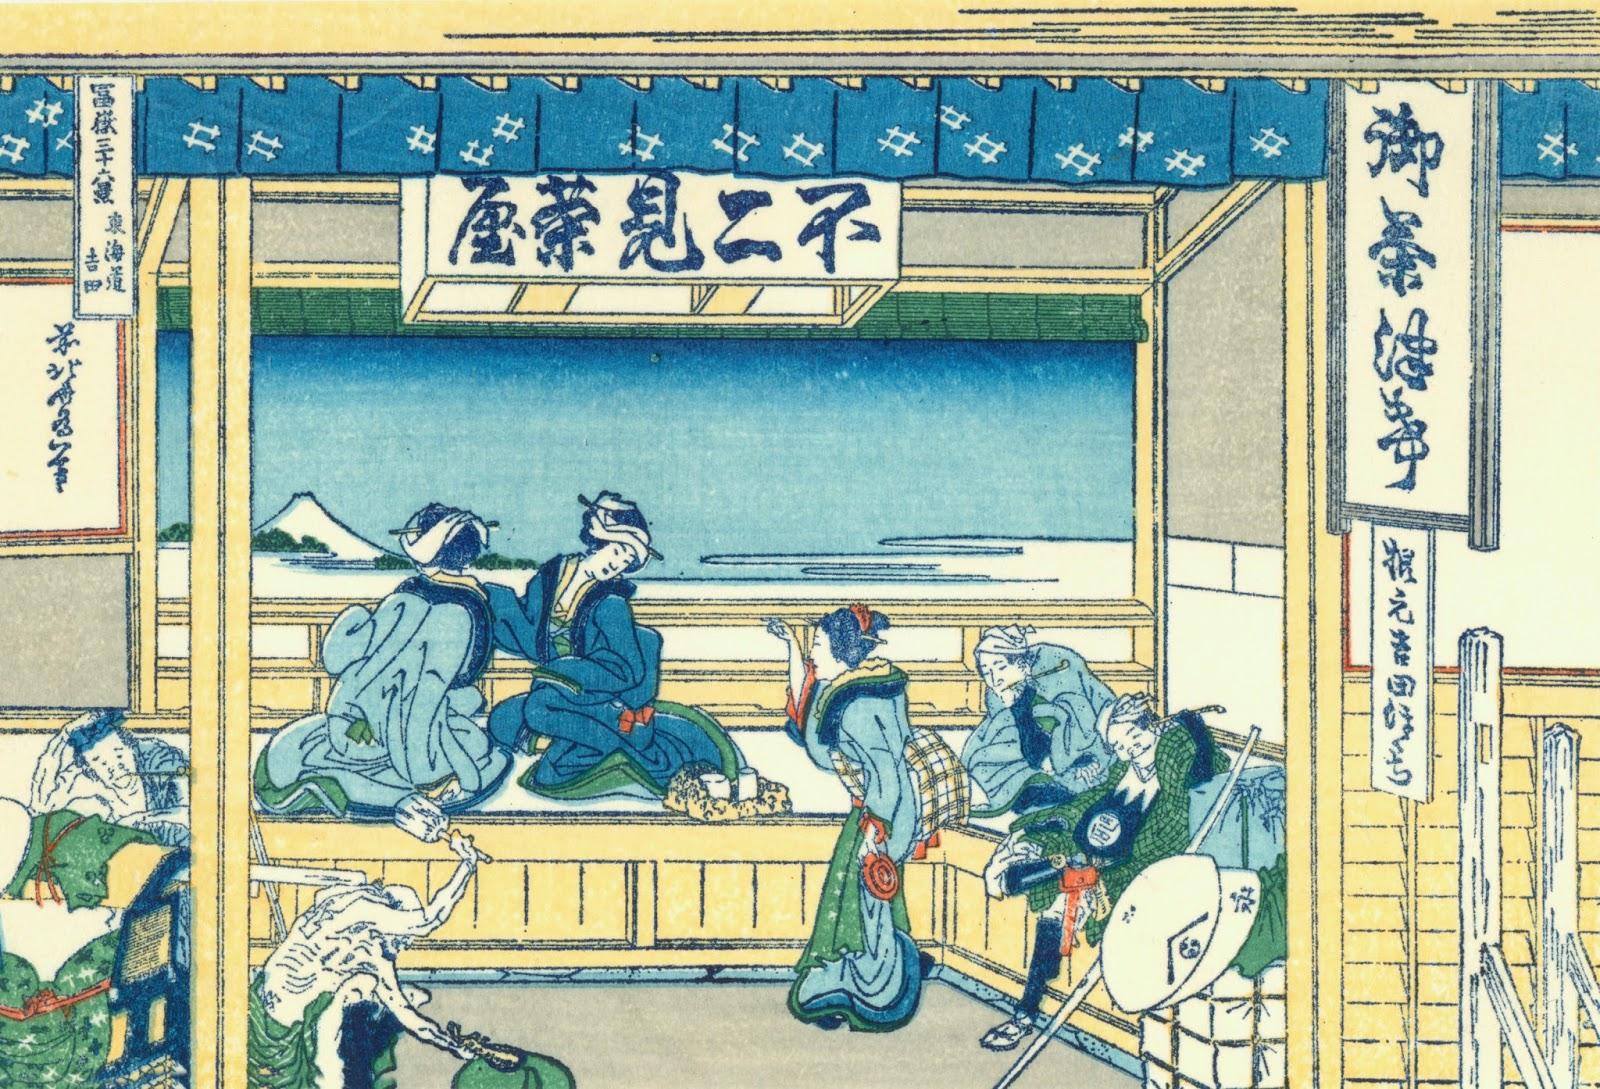 Solitary Dog Sculptor I: Engravings - Grabados: Katsushika Hokusai ...